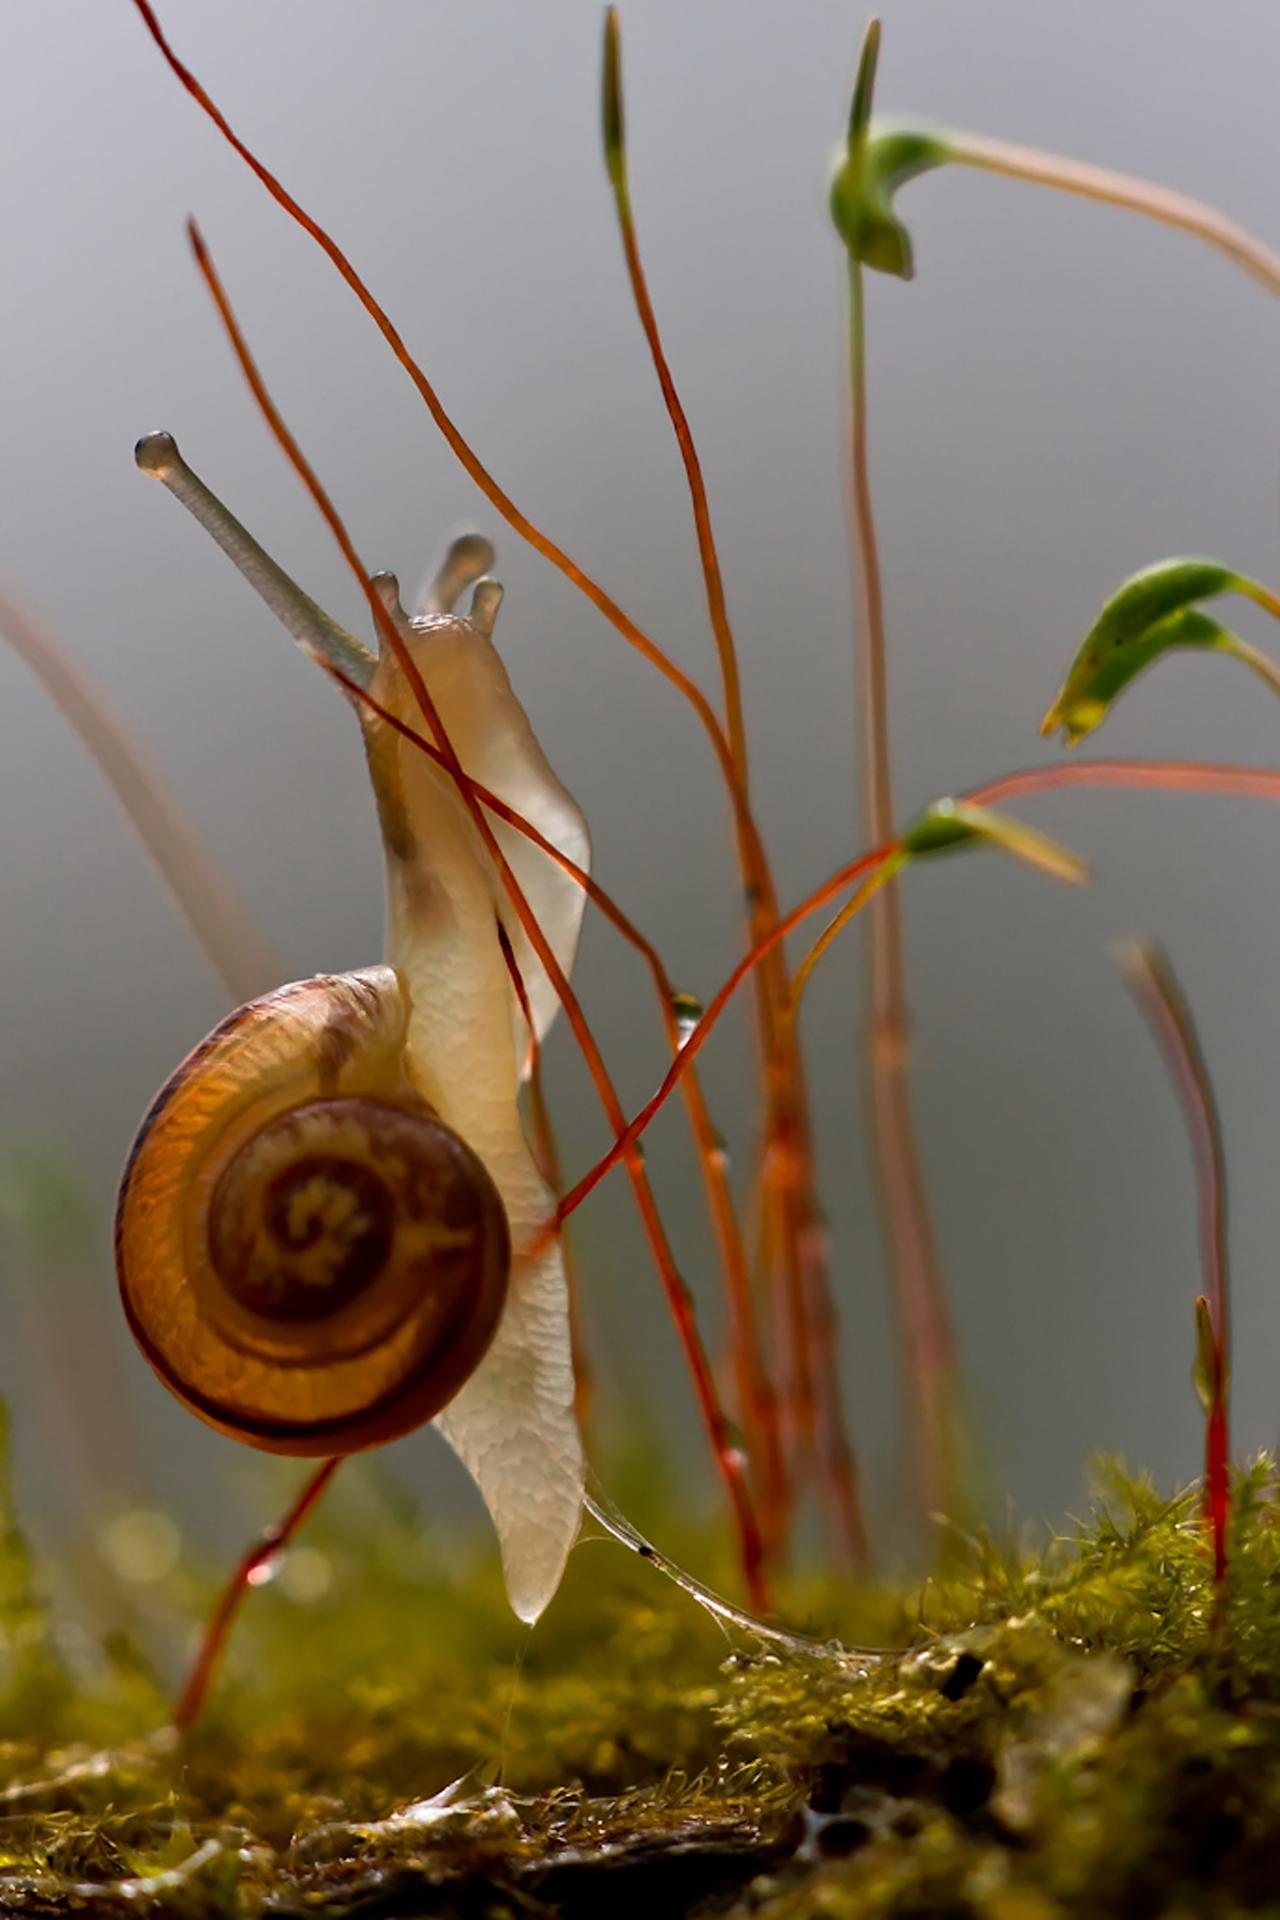 Escargot des jardins ©Pascal Jahan